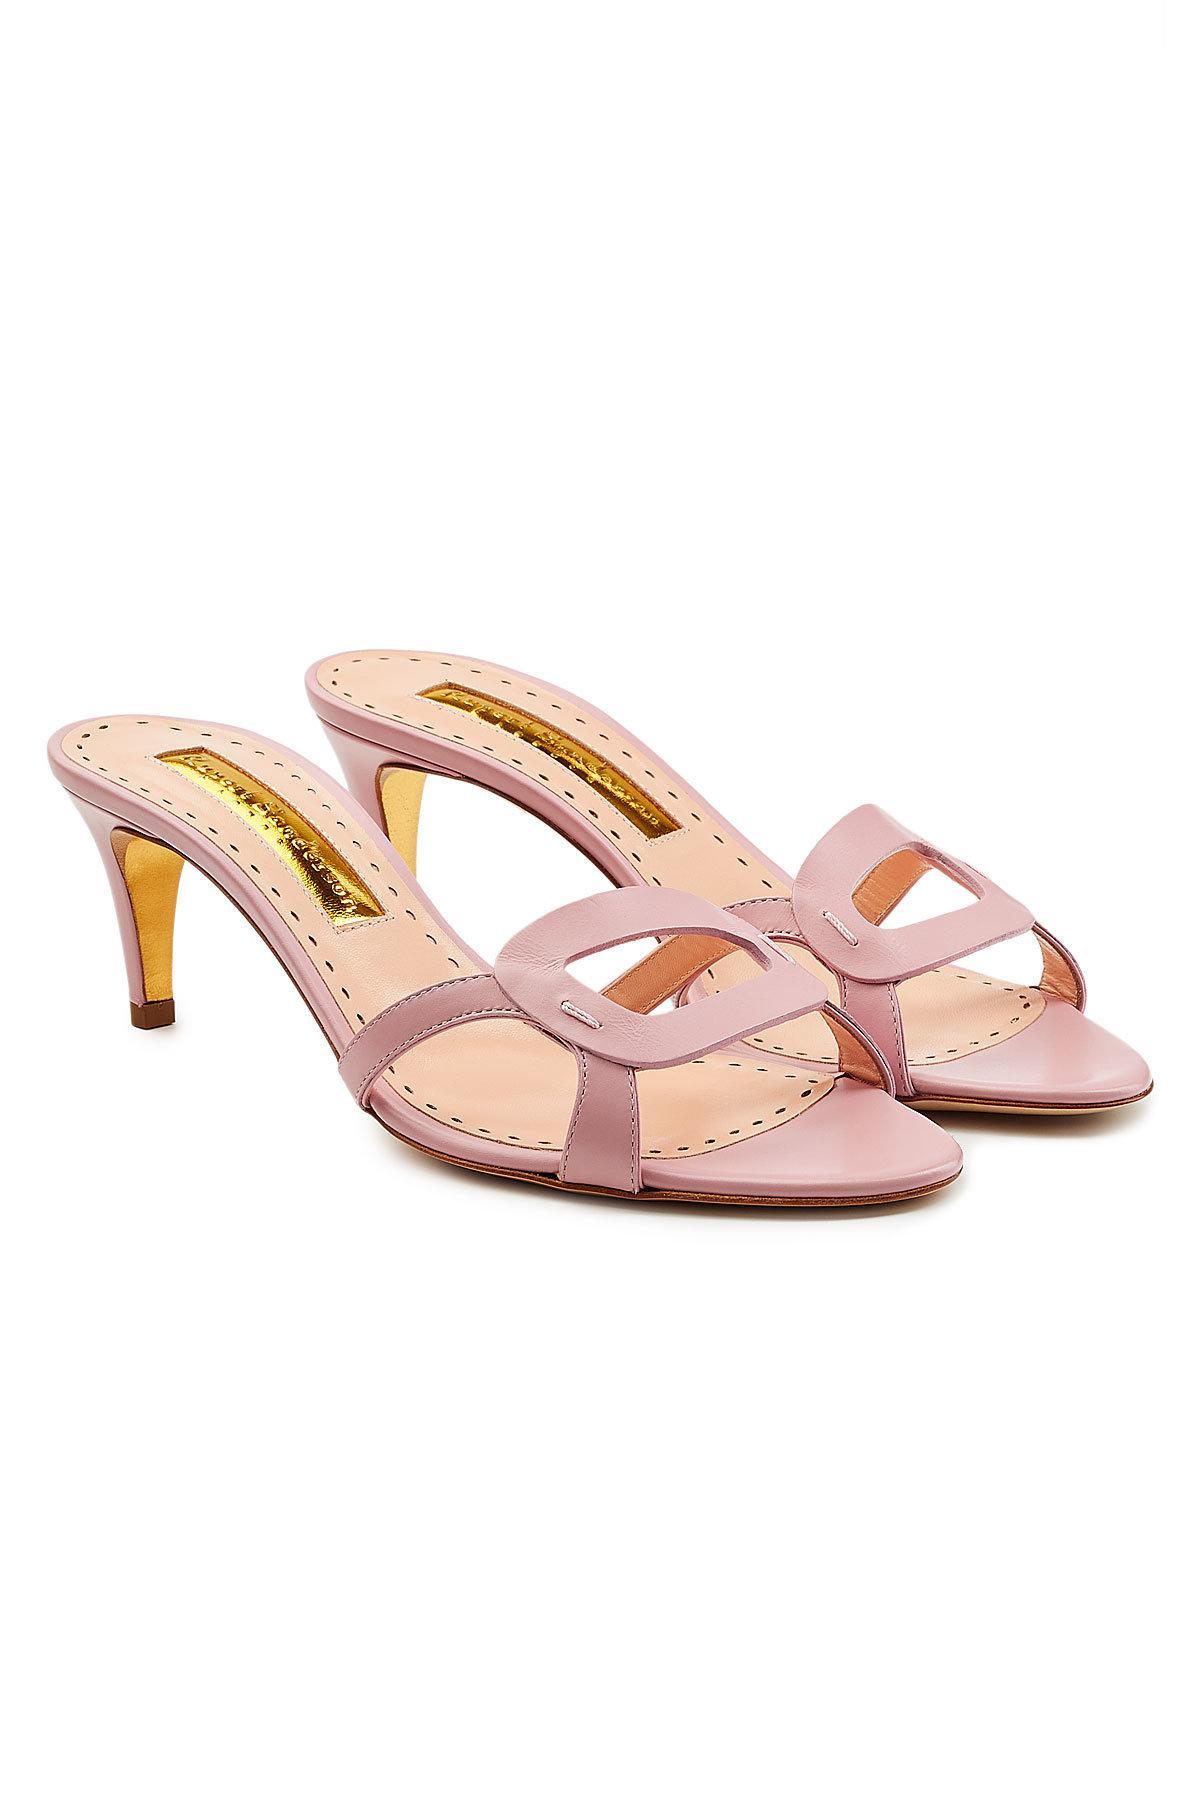 Rupert Sanderson Maeve leather sandals 4CKZLFaXq